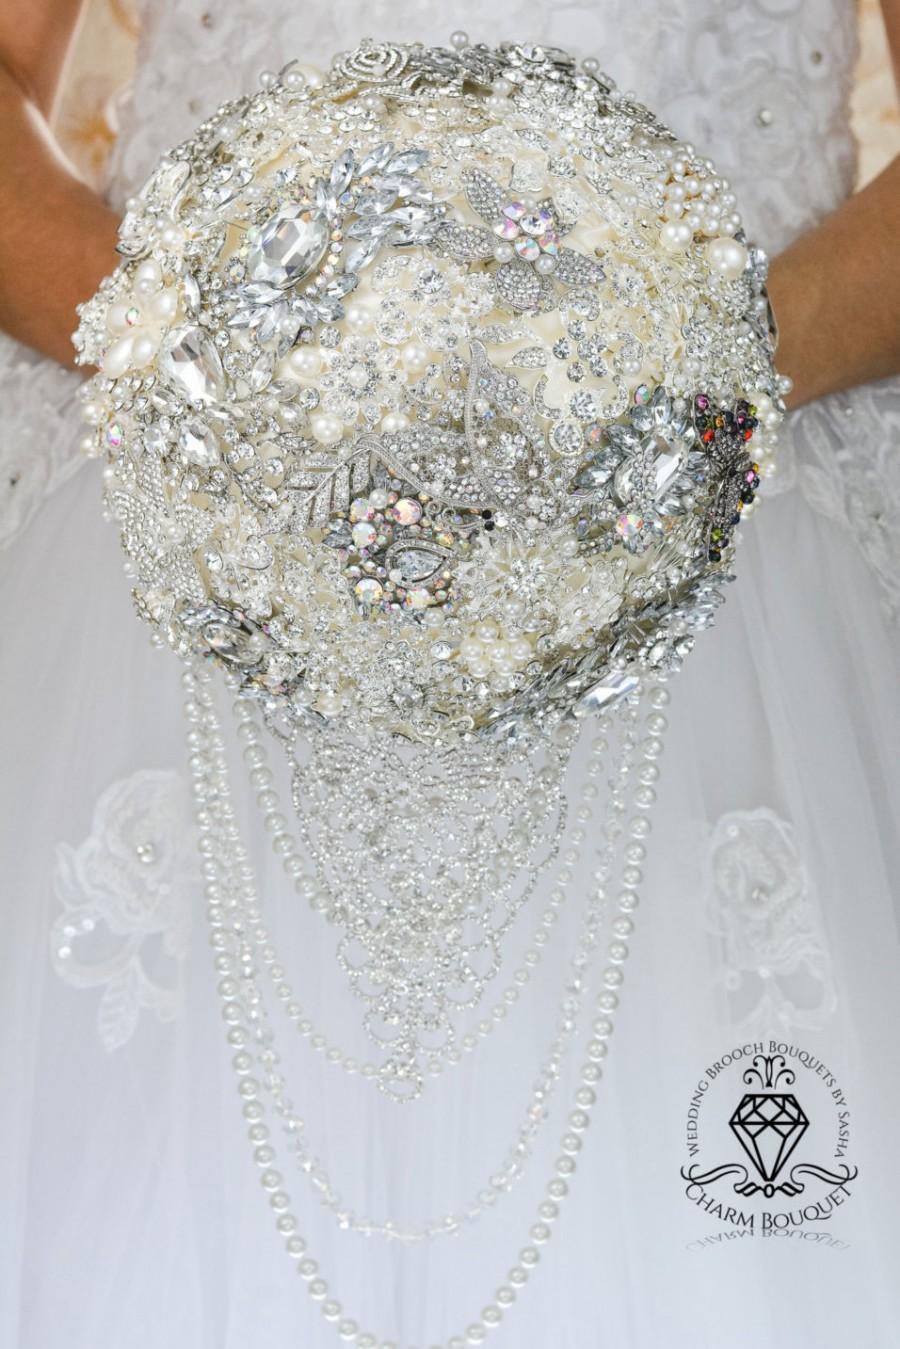 Свадьба - Brooch Bouquet Wedding Bouquet Crystal Bouquet Cascade Brooch Bouquet Bridal Bouquet Bridesmaids Bouquet Jewel  Brooch Bouquets for Brides